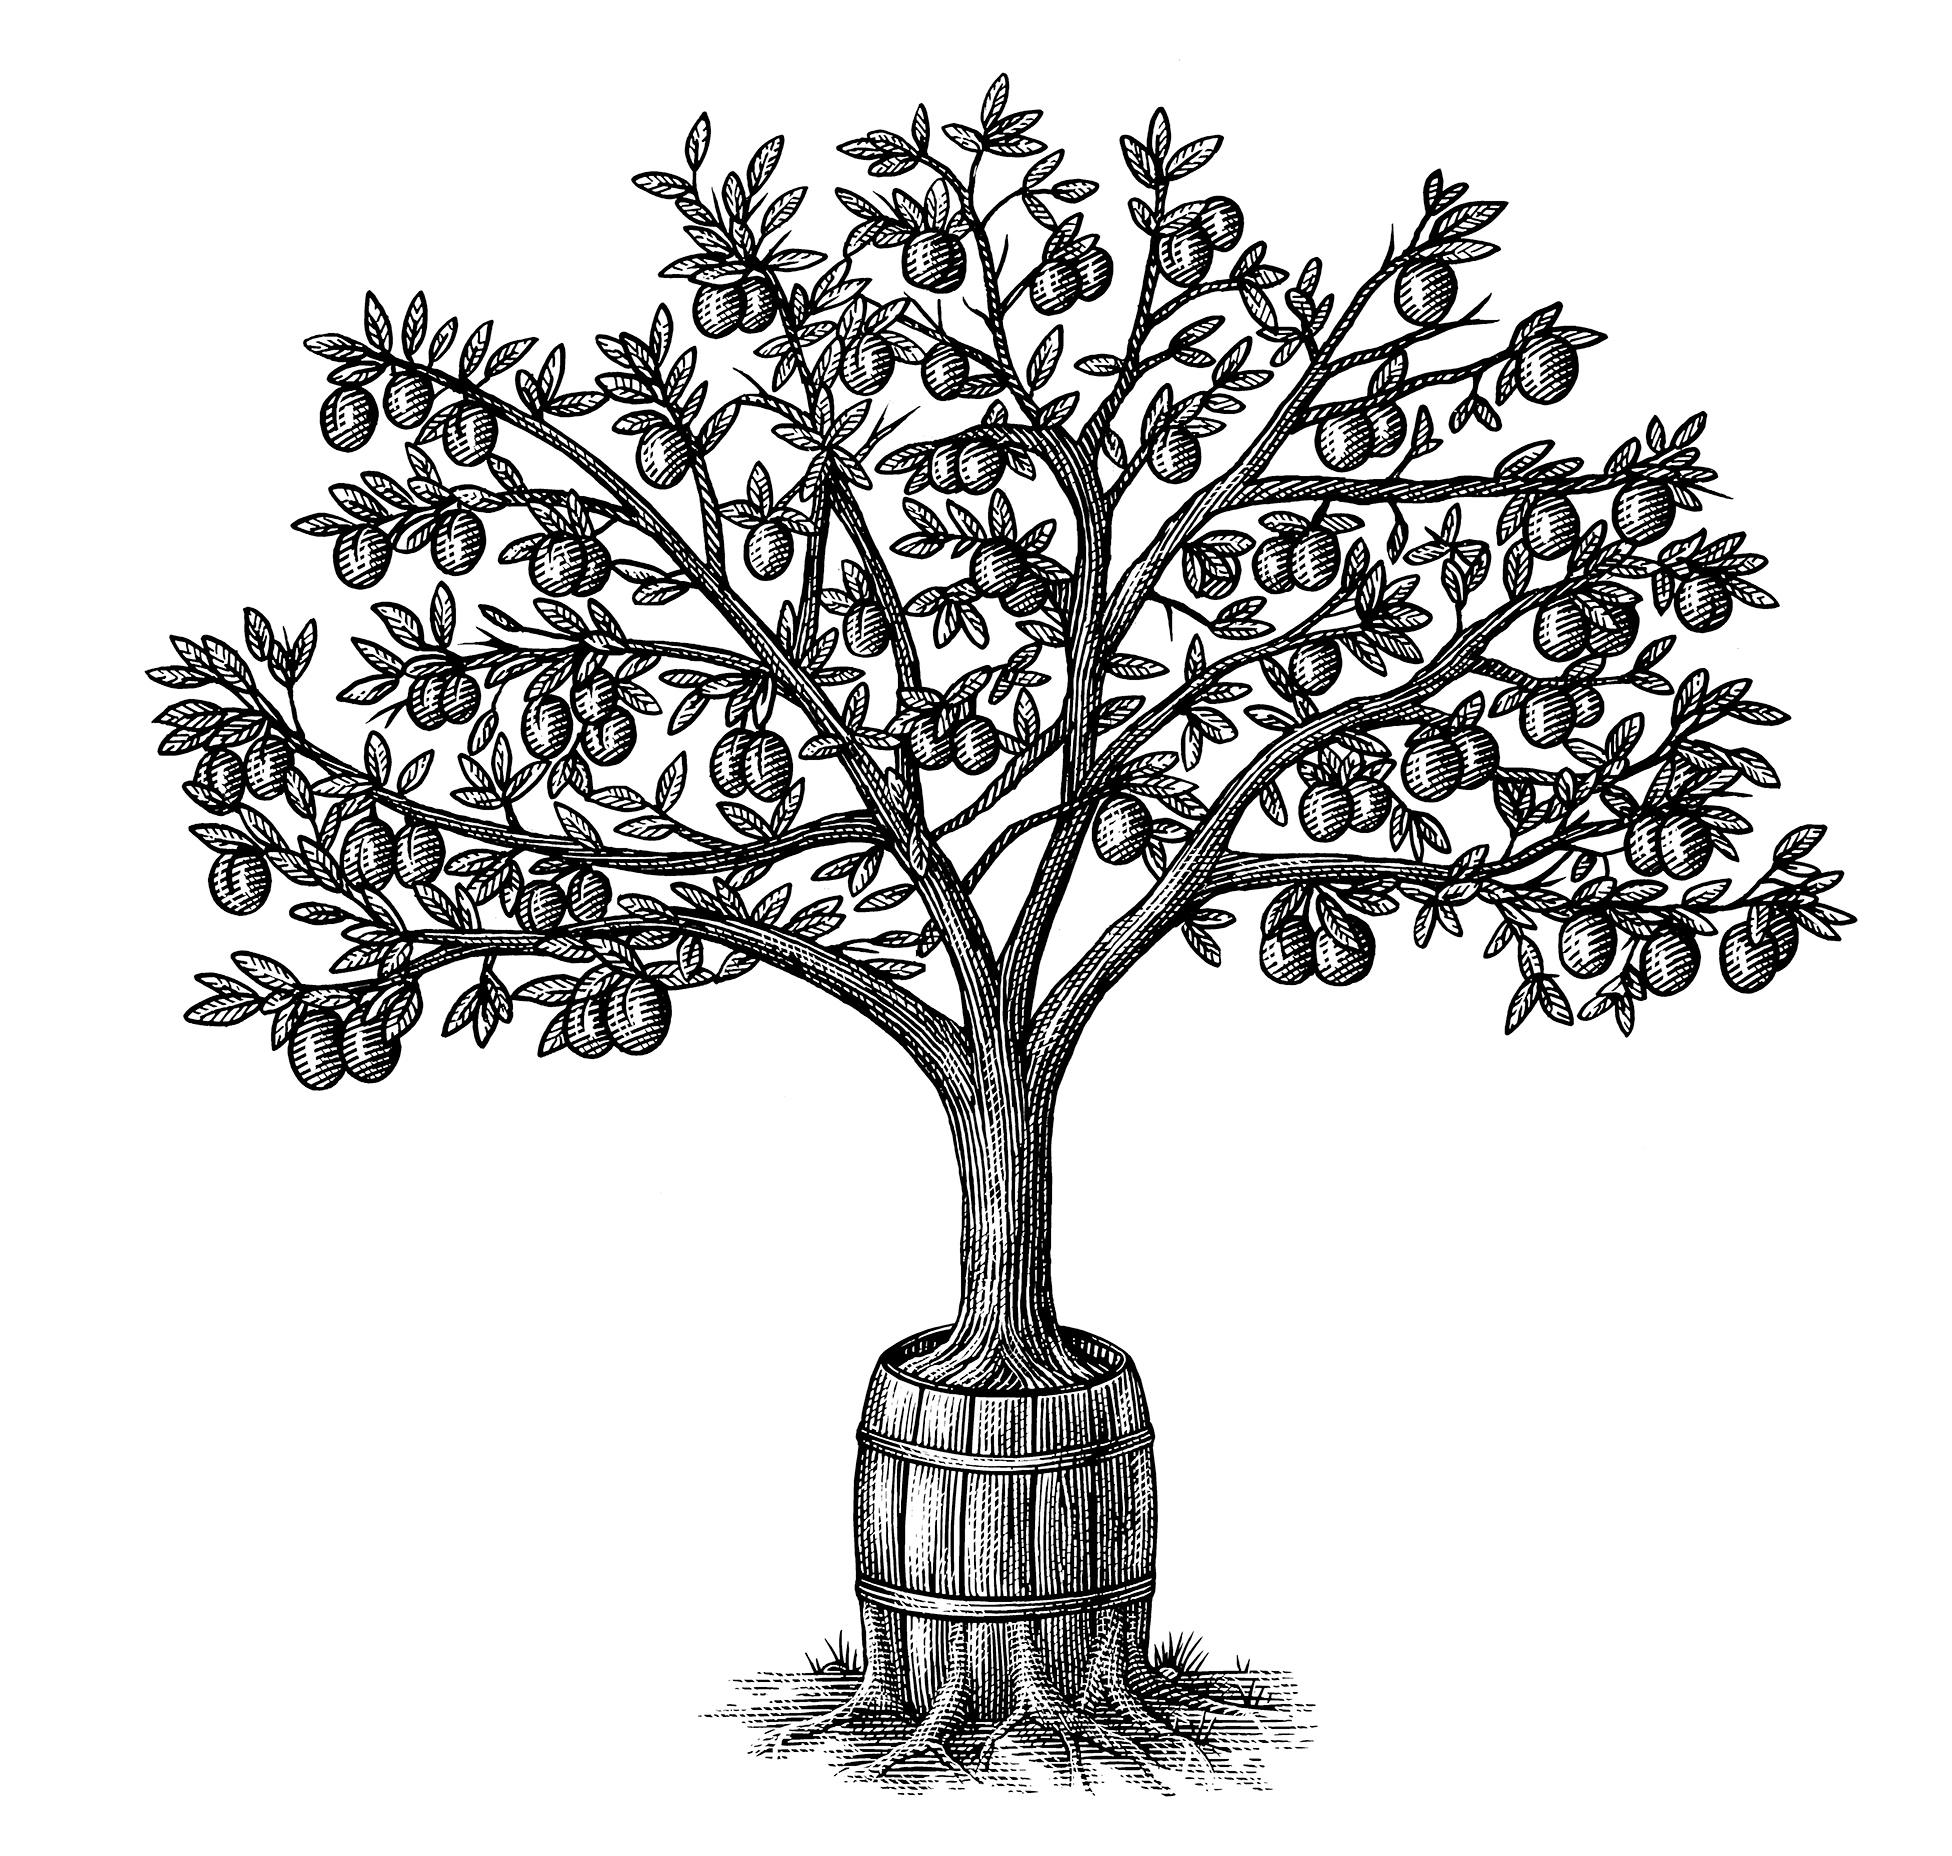 Plumwood Barrel Aged Bourbon